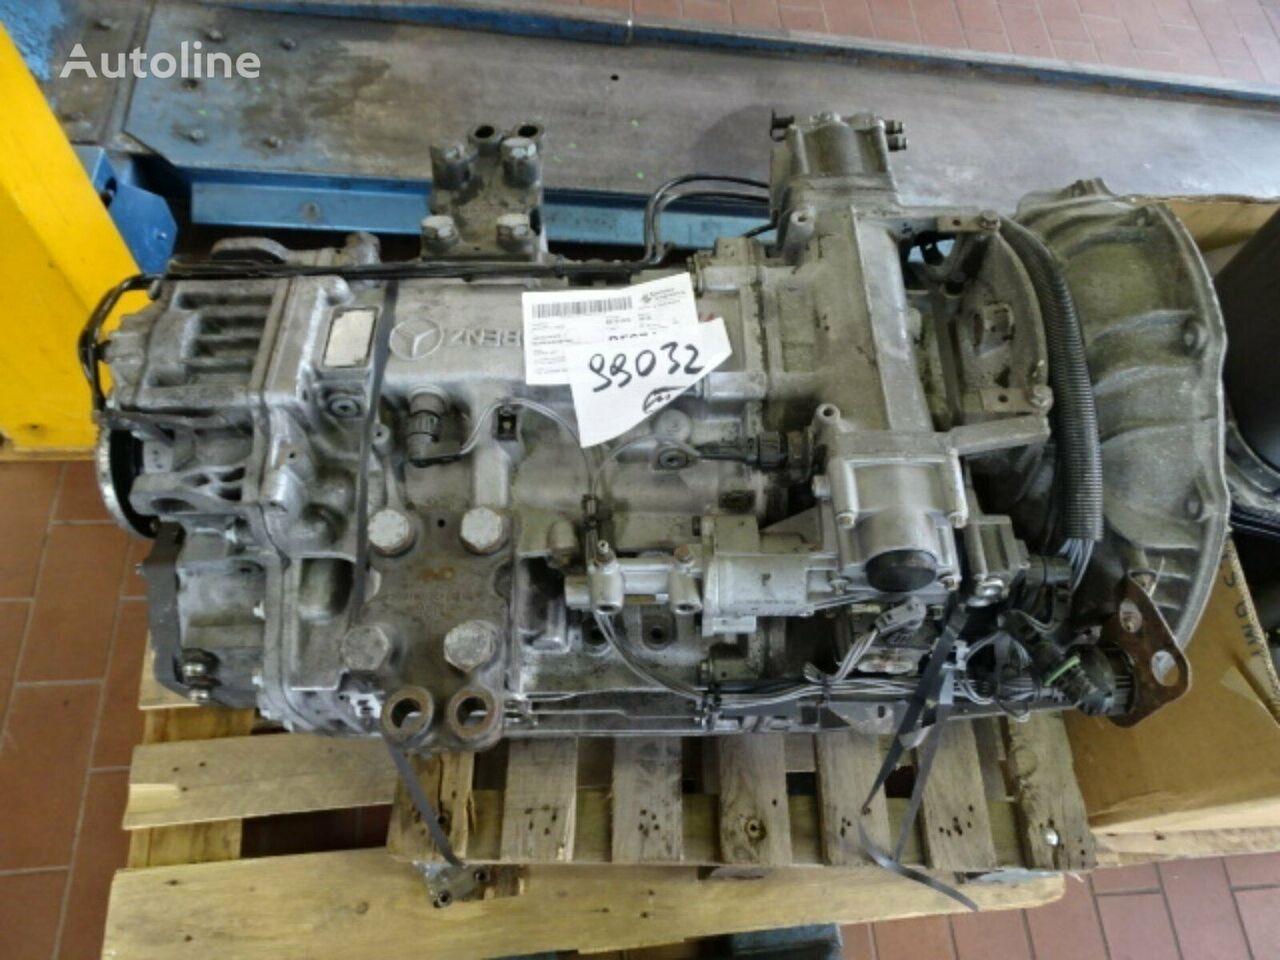 MERCEDES-BENZ (715510) gearbox for MERCEDES-BENZ Actros truck